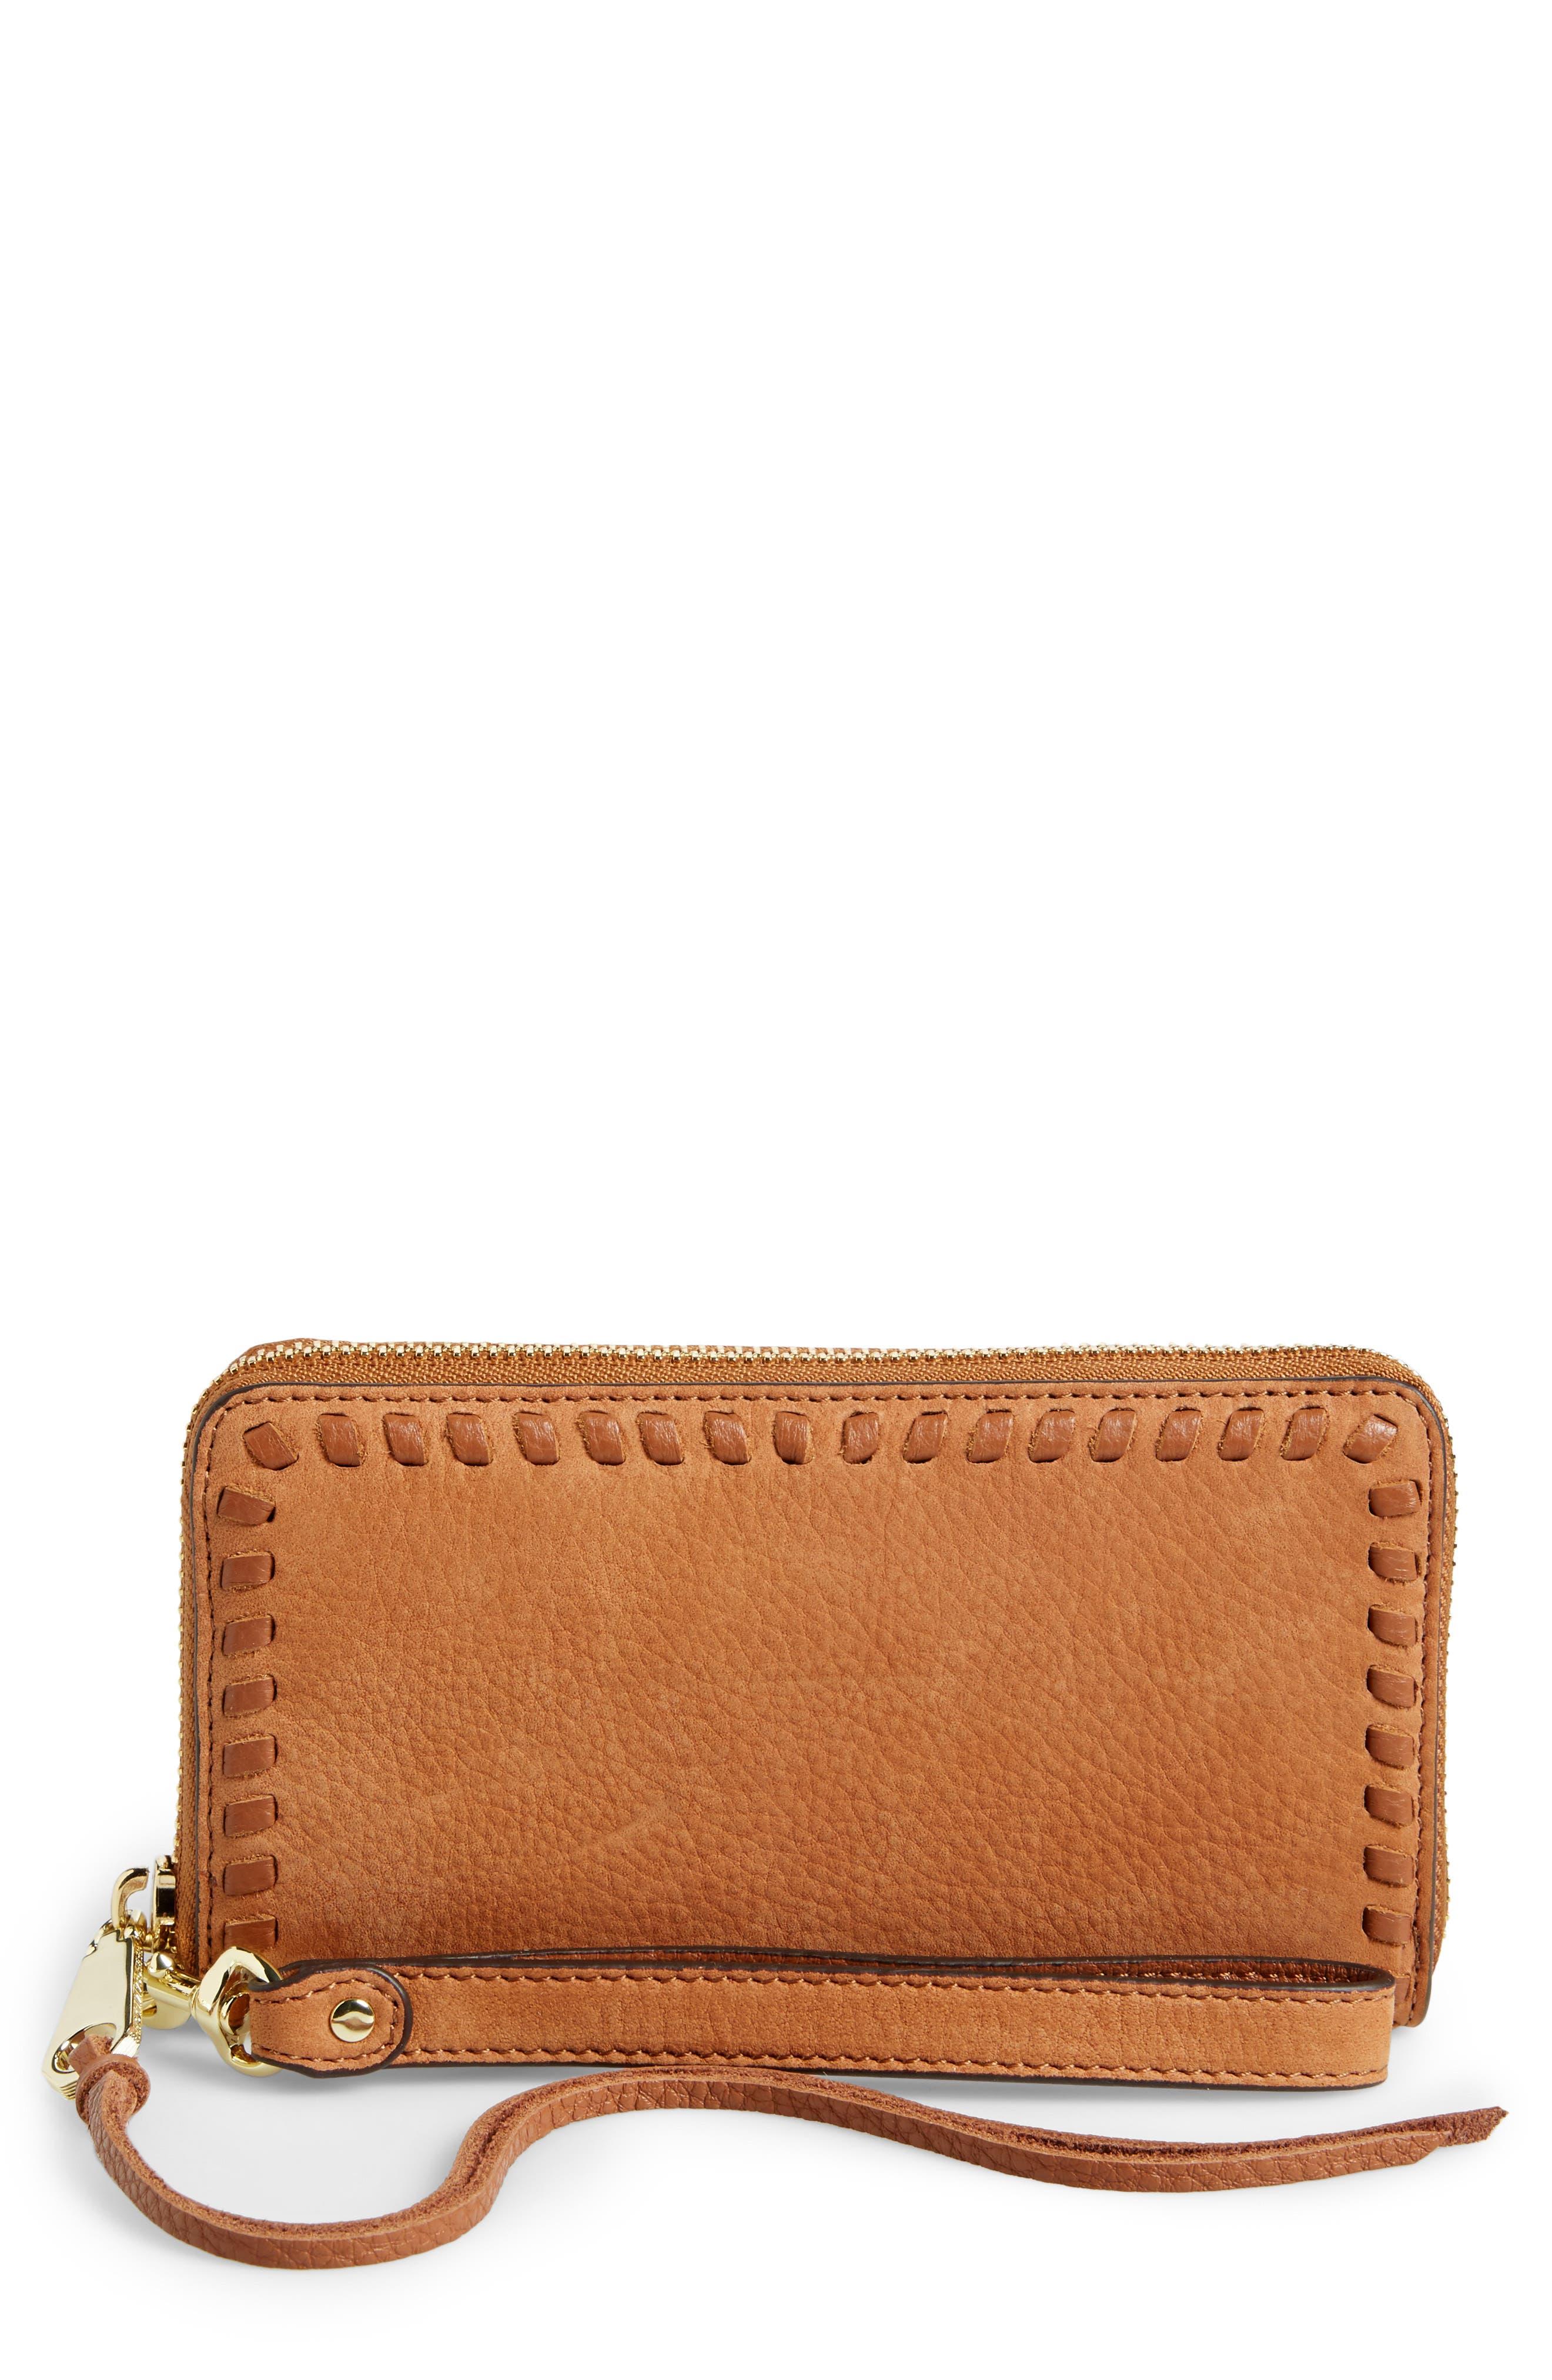 Vanity Nubuck Leather Phone Wallet,                         Main,                         color, 230